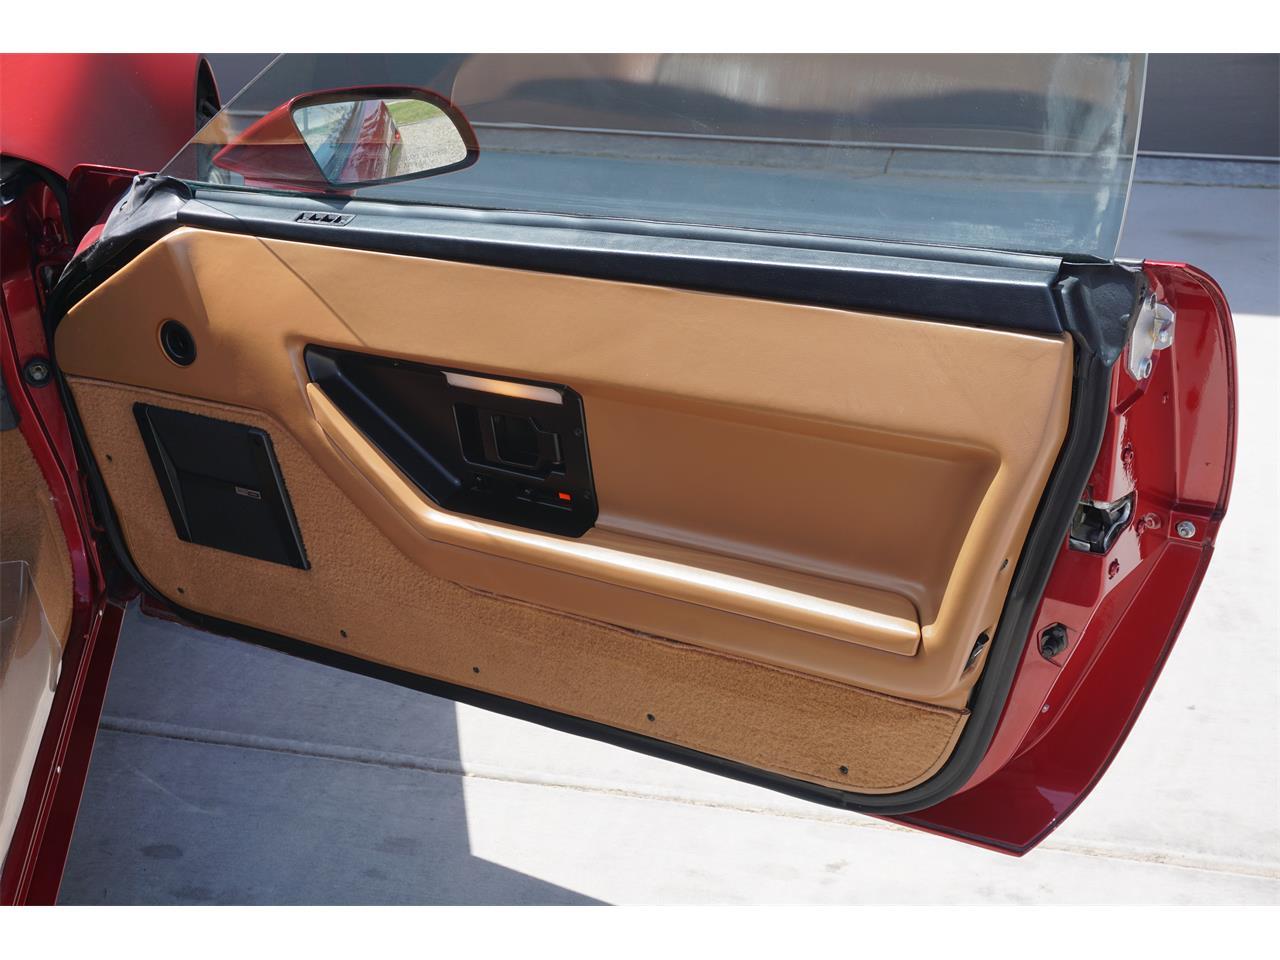 Large Picture of '89 Chevrolet Corvette C4 located in Grand Junction Colorado - QTU6